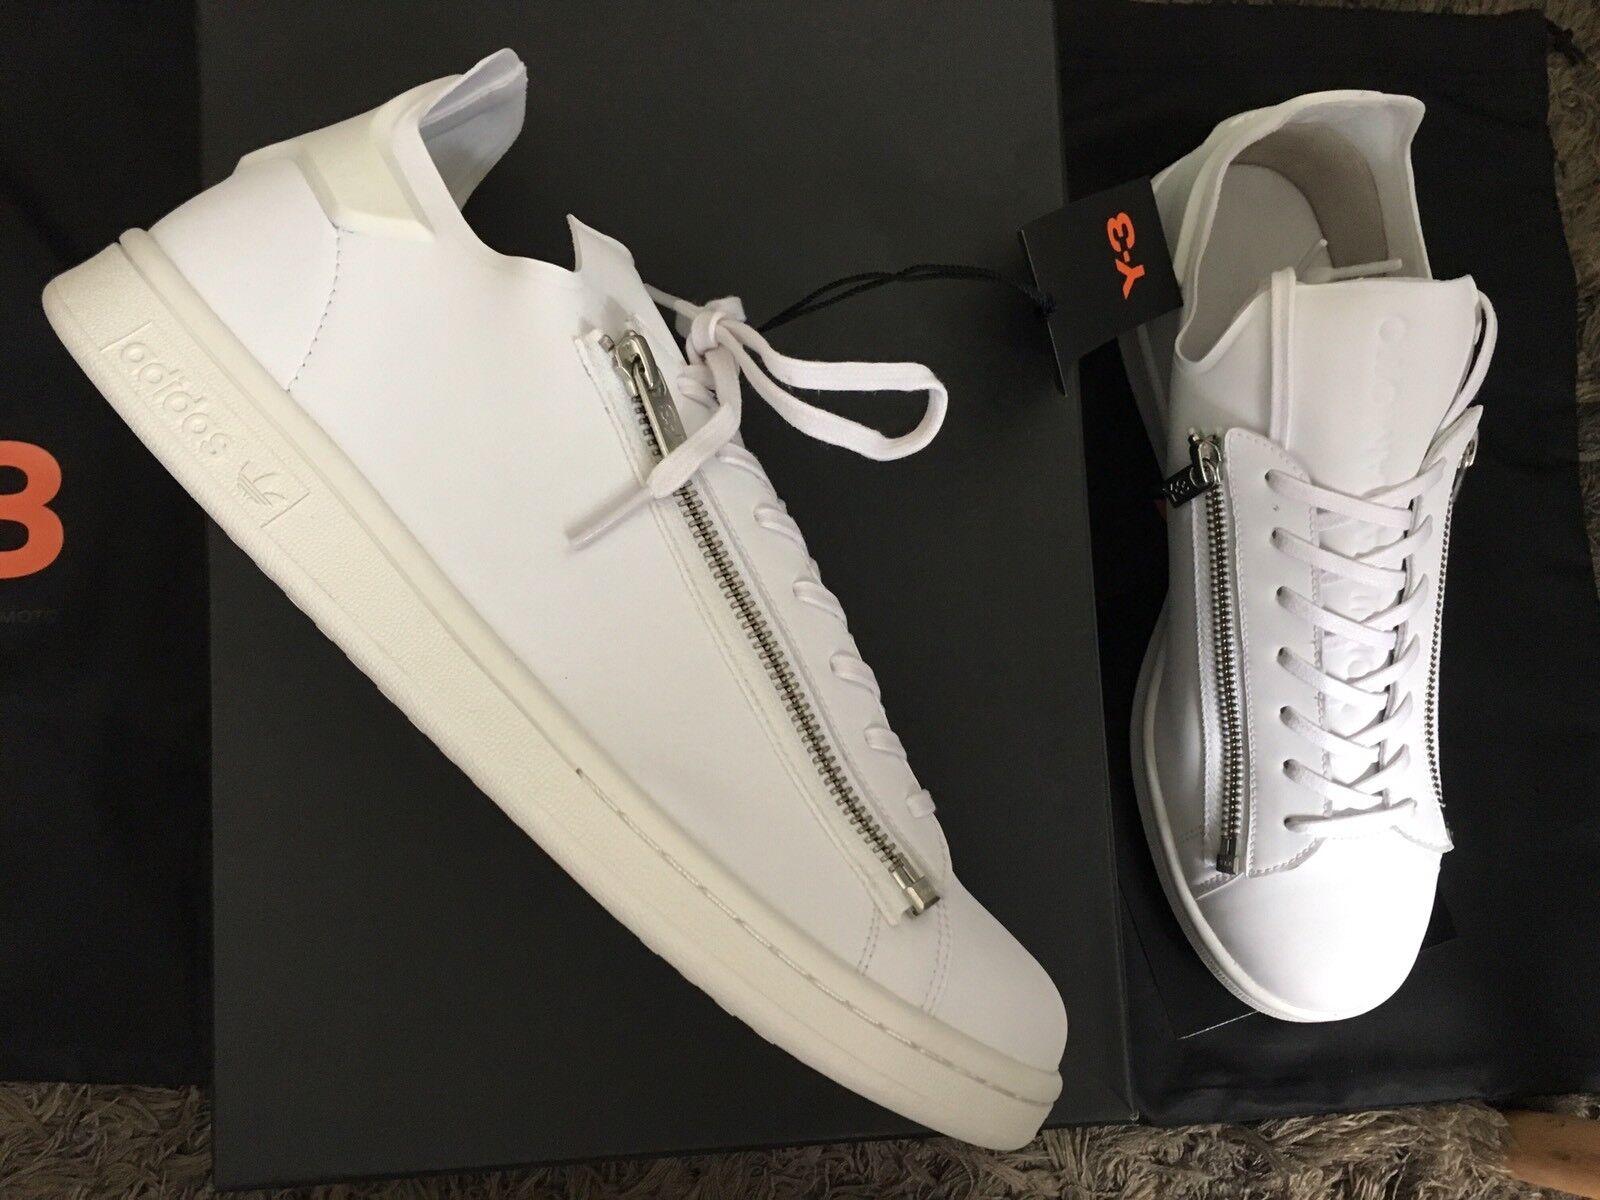 Adidas y3 Stan Smith Zip Weiß DEADSTOCK 9,5us 9uk 43 1 3fr NIB Yohji Yamamoto